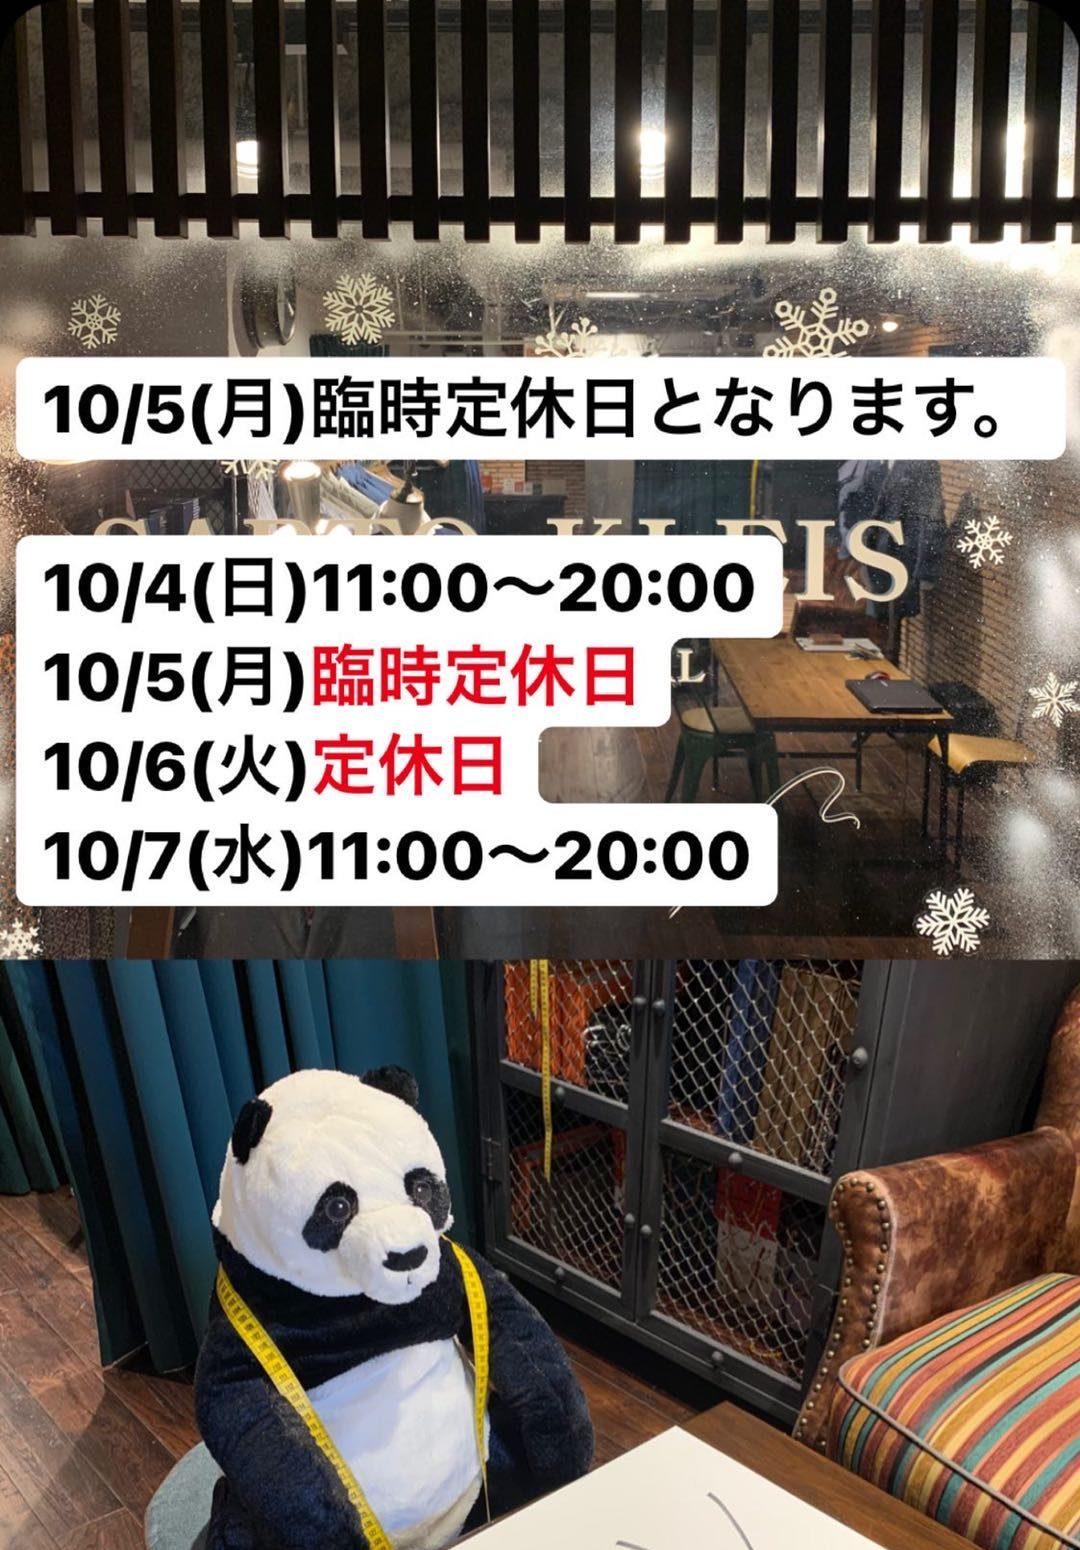 WechatIMG190 e1601703895659 - 【京都店】臨時定休日のお知らせ